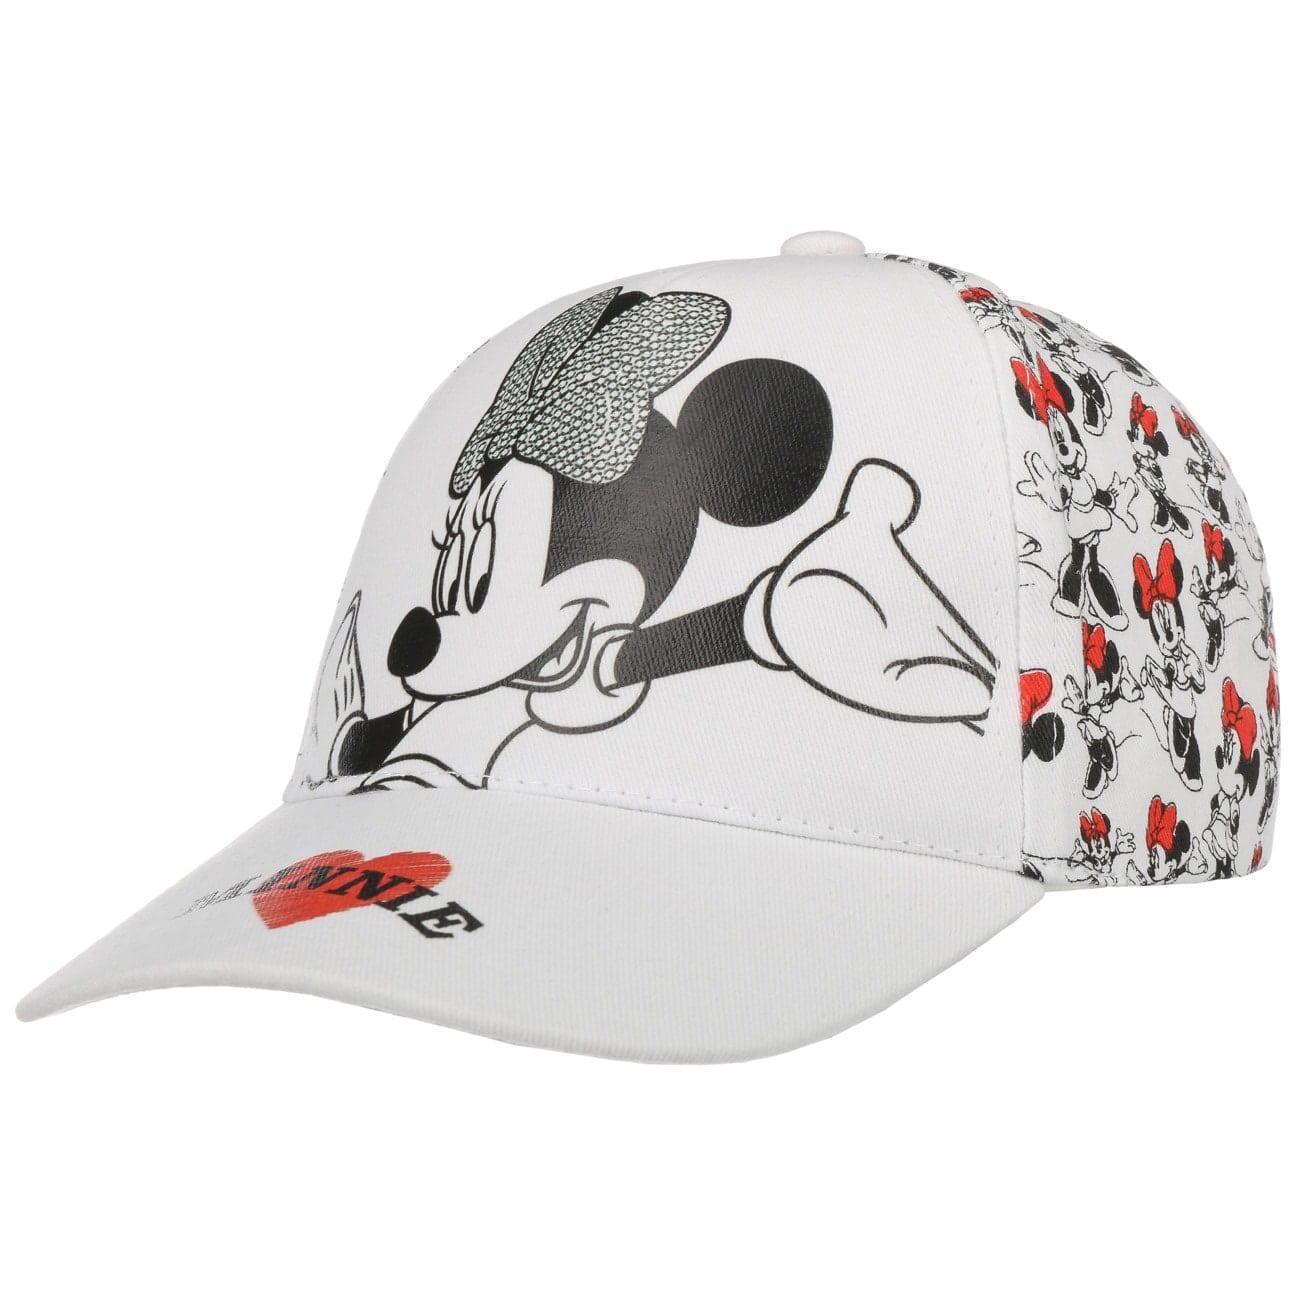 minnie-mouse-madchencap-baseballcap